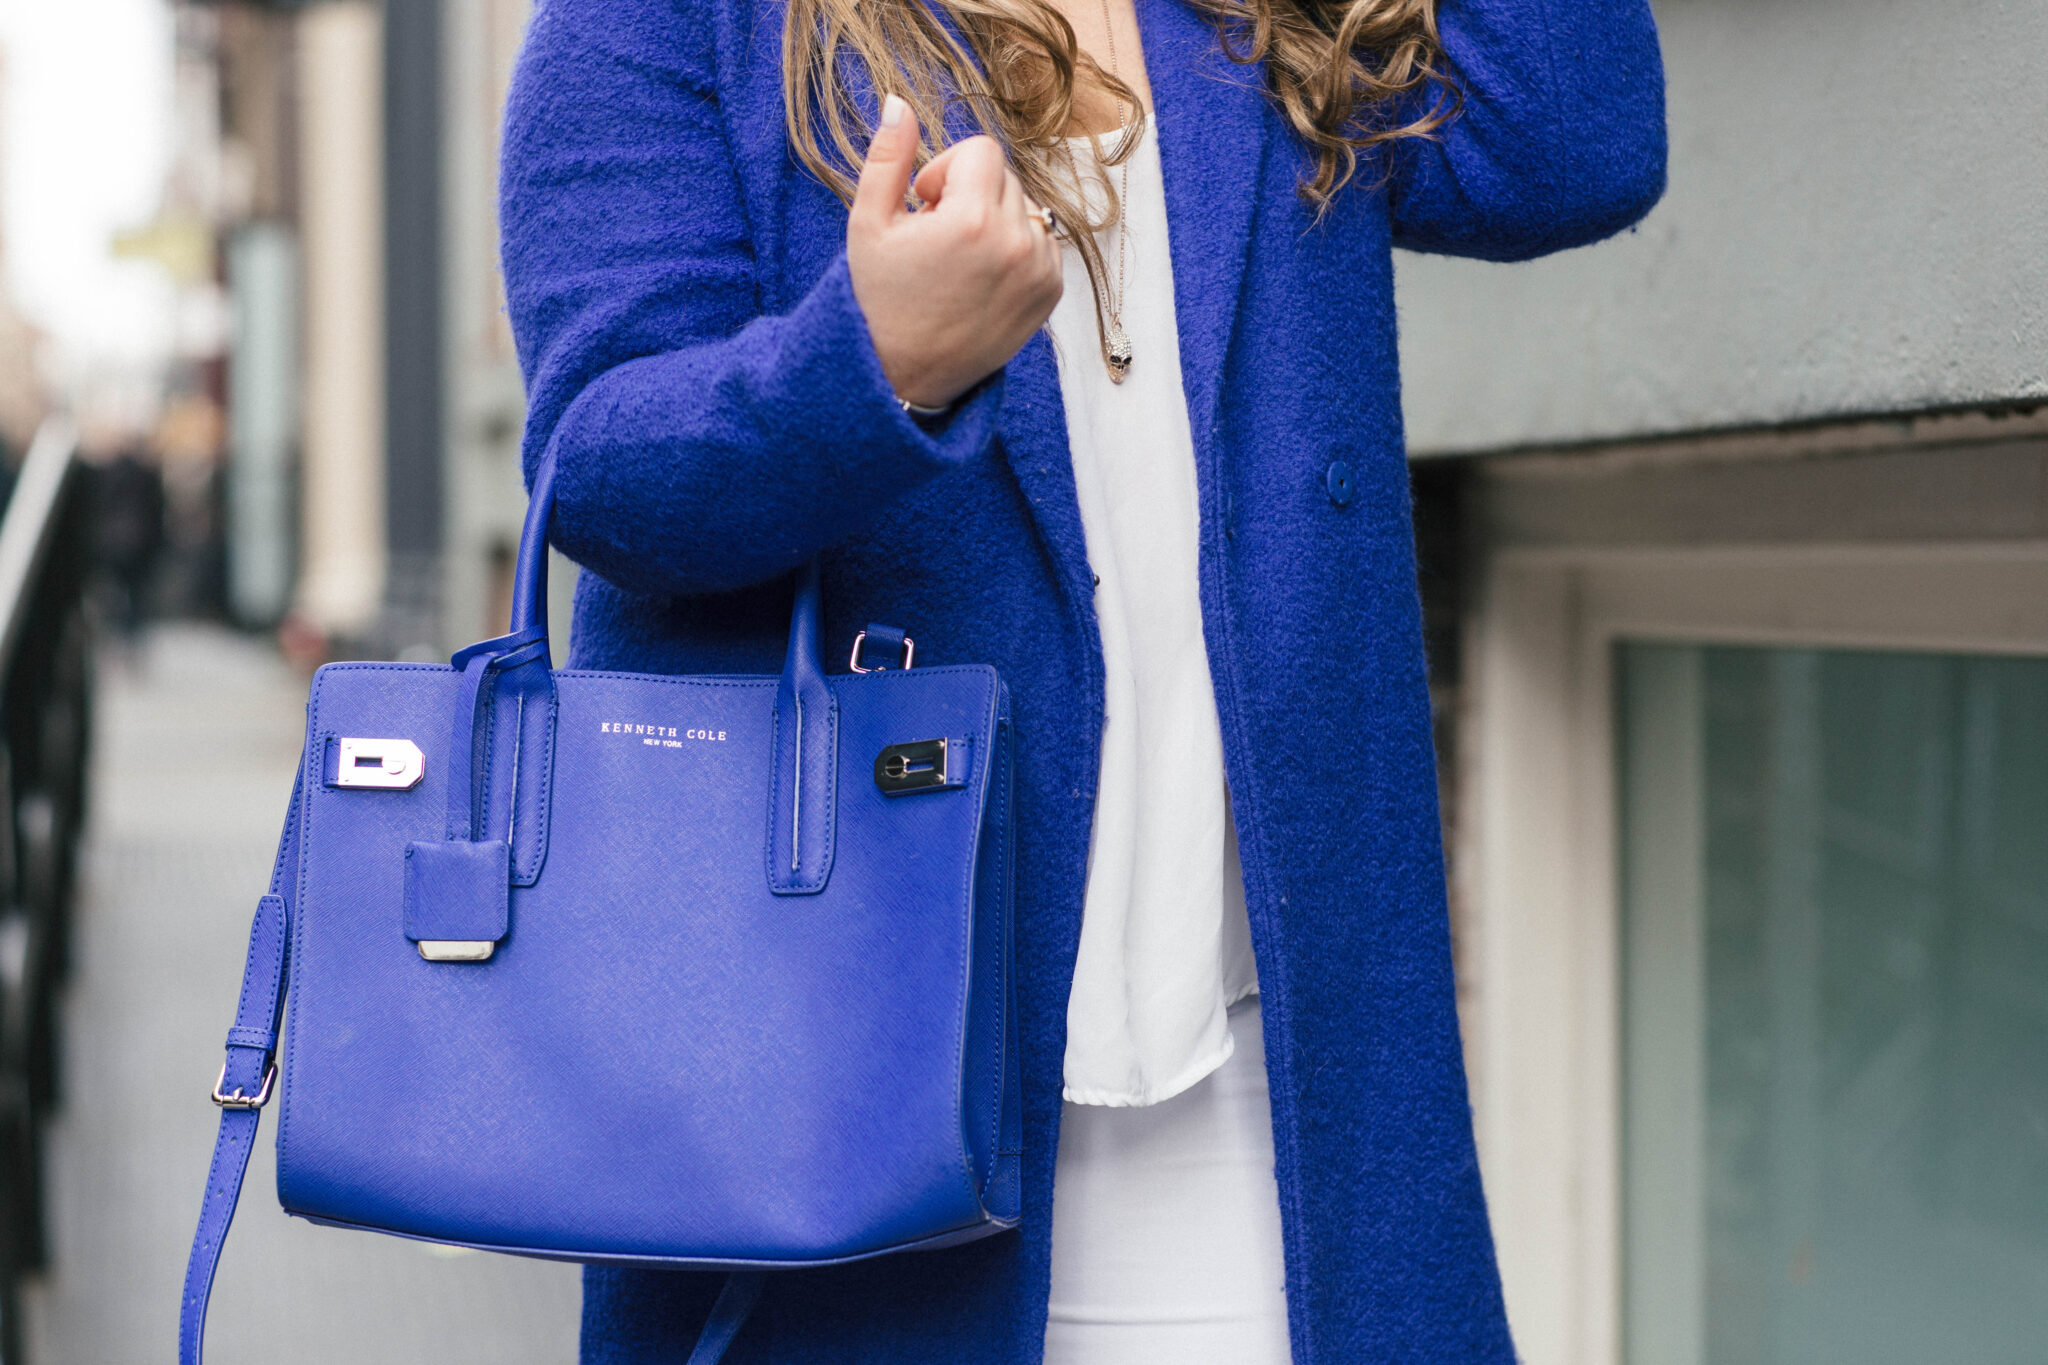 missyonmadison, melissa tierney, fashion blog, fashion blogger, missyonmadison instagram, style blogger, style blog, la blogger, blue coat, cobalt blue coat, cobalt blue pumps, blue pumps, white skinny jeans, white distressed skinny jeans, beauty blogger, nyc blogger, new york city blogger, nyc blogger, white chiffon blouse, cobalt blue satchel, blue plaid scarf,